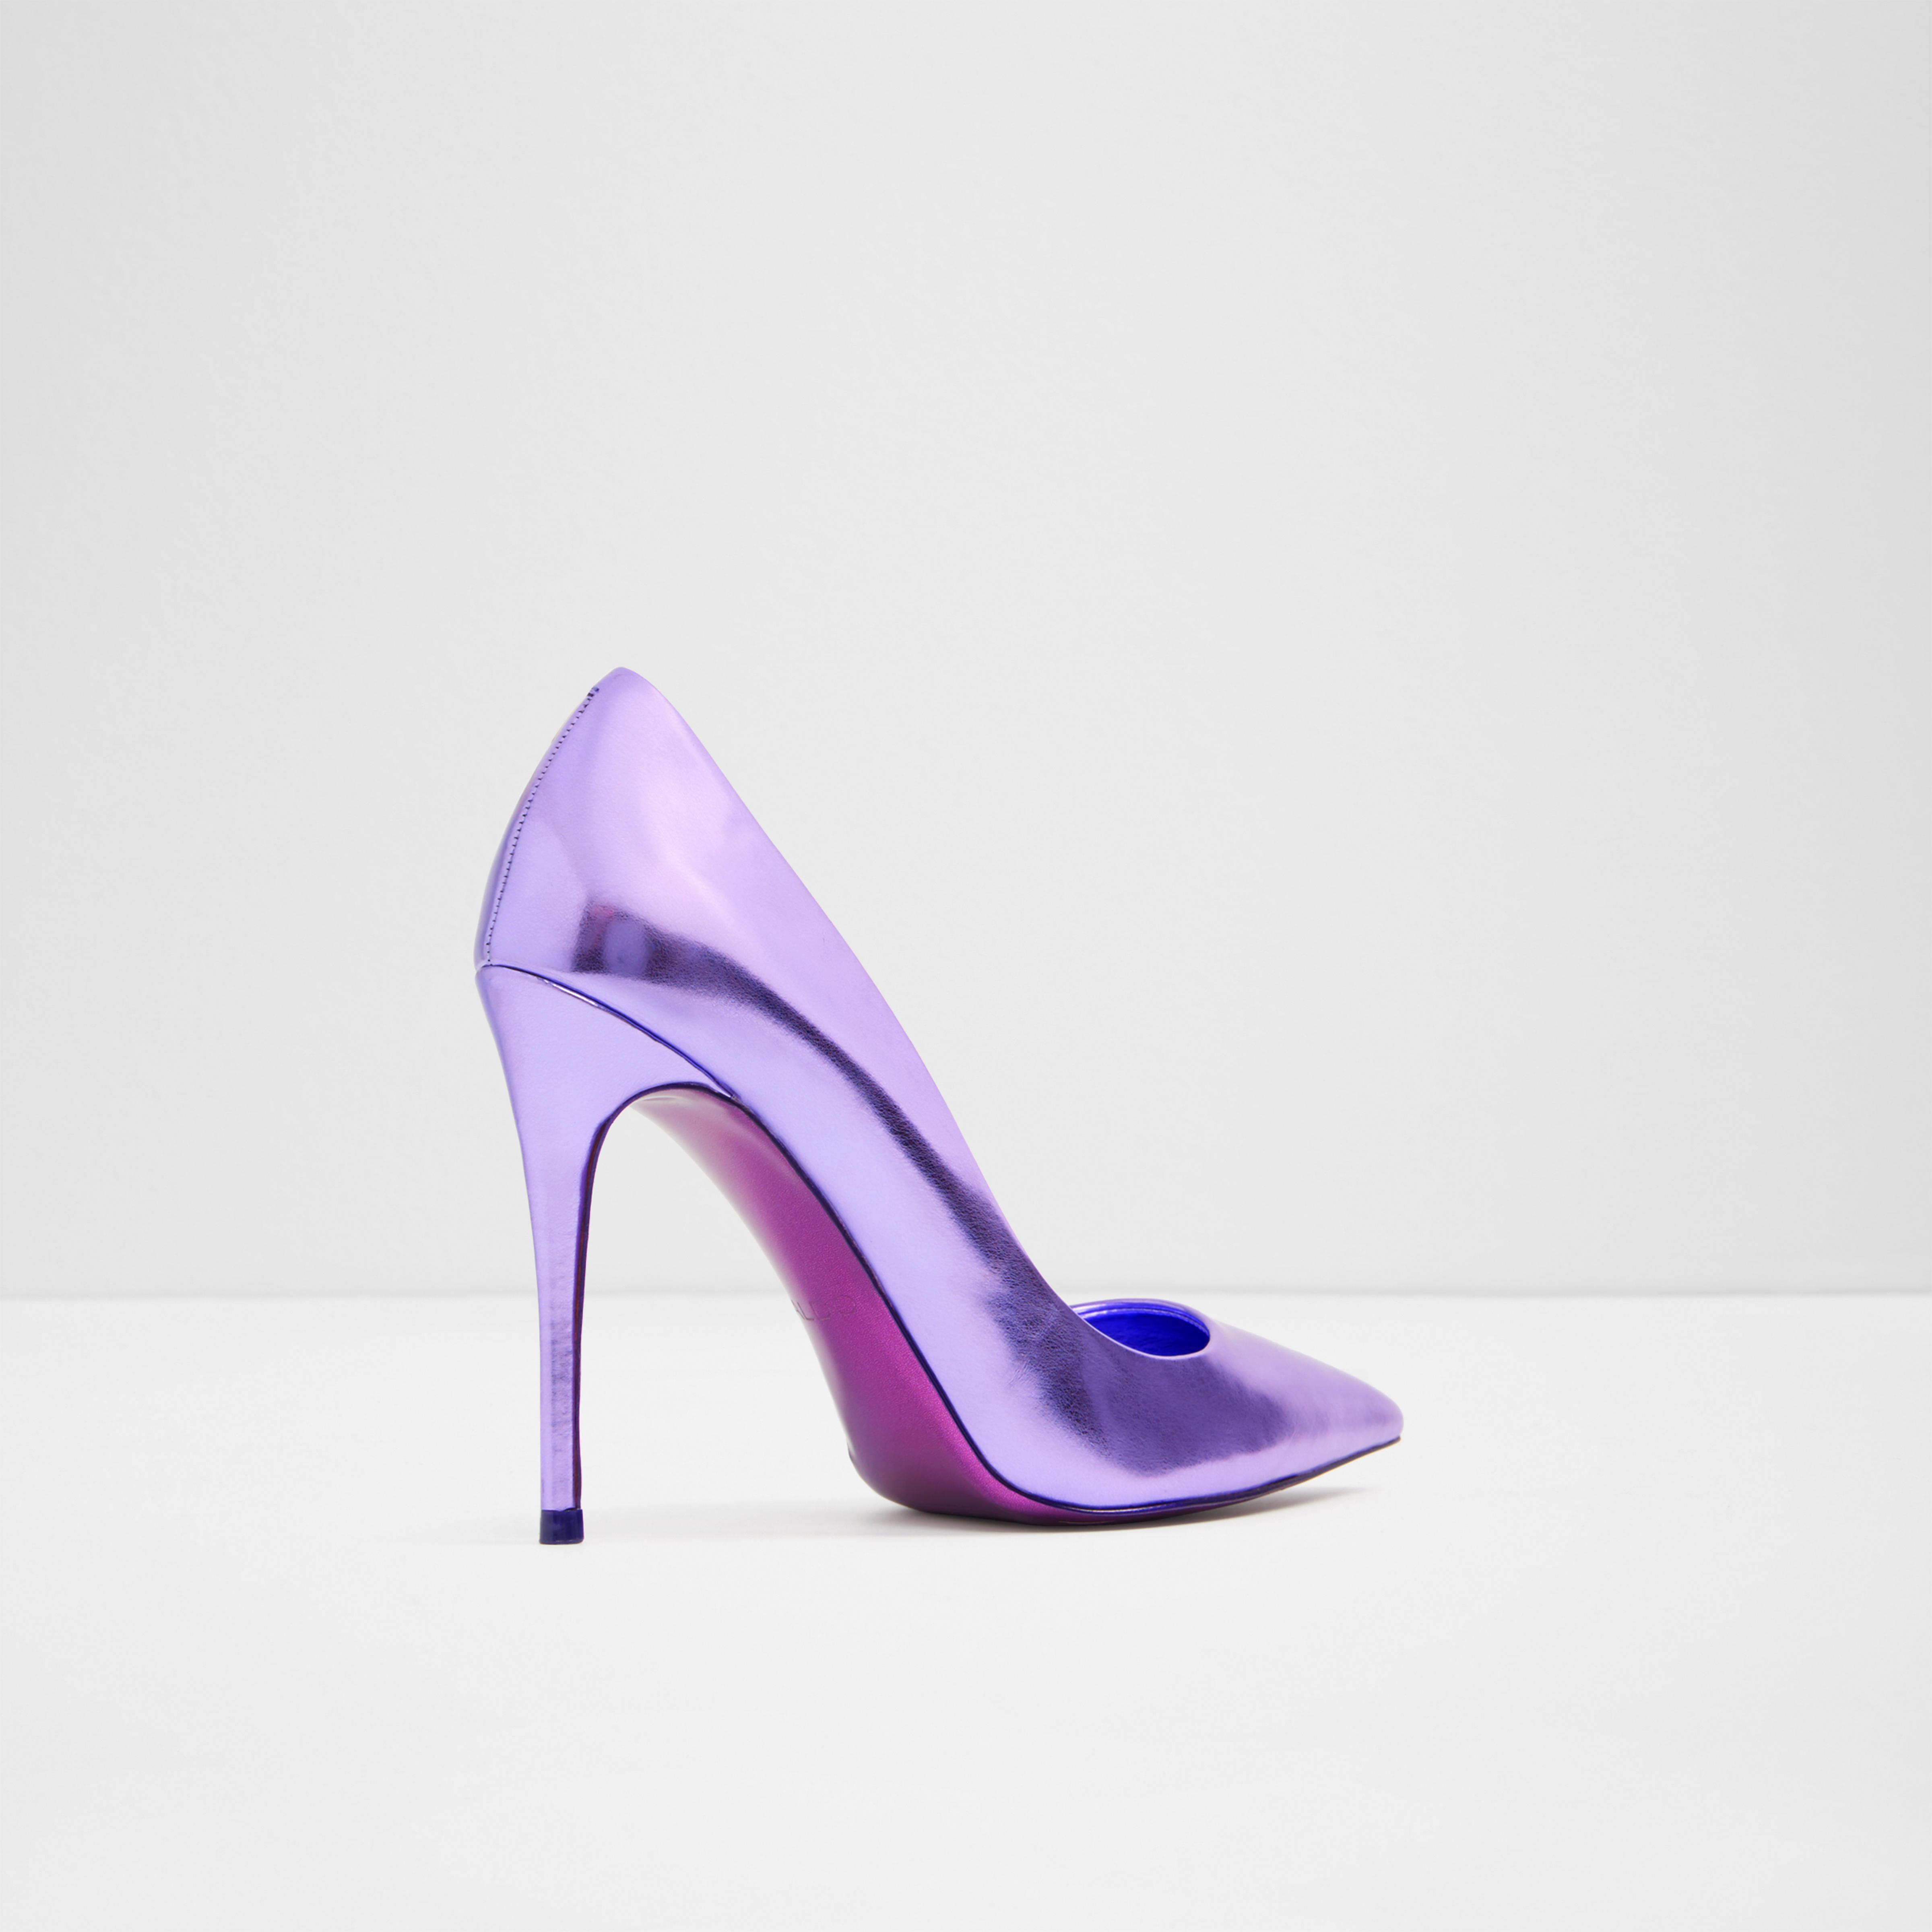 52a64a64a13b Aldo Stessy  in Purple - Lyst